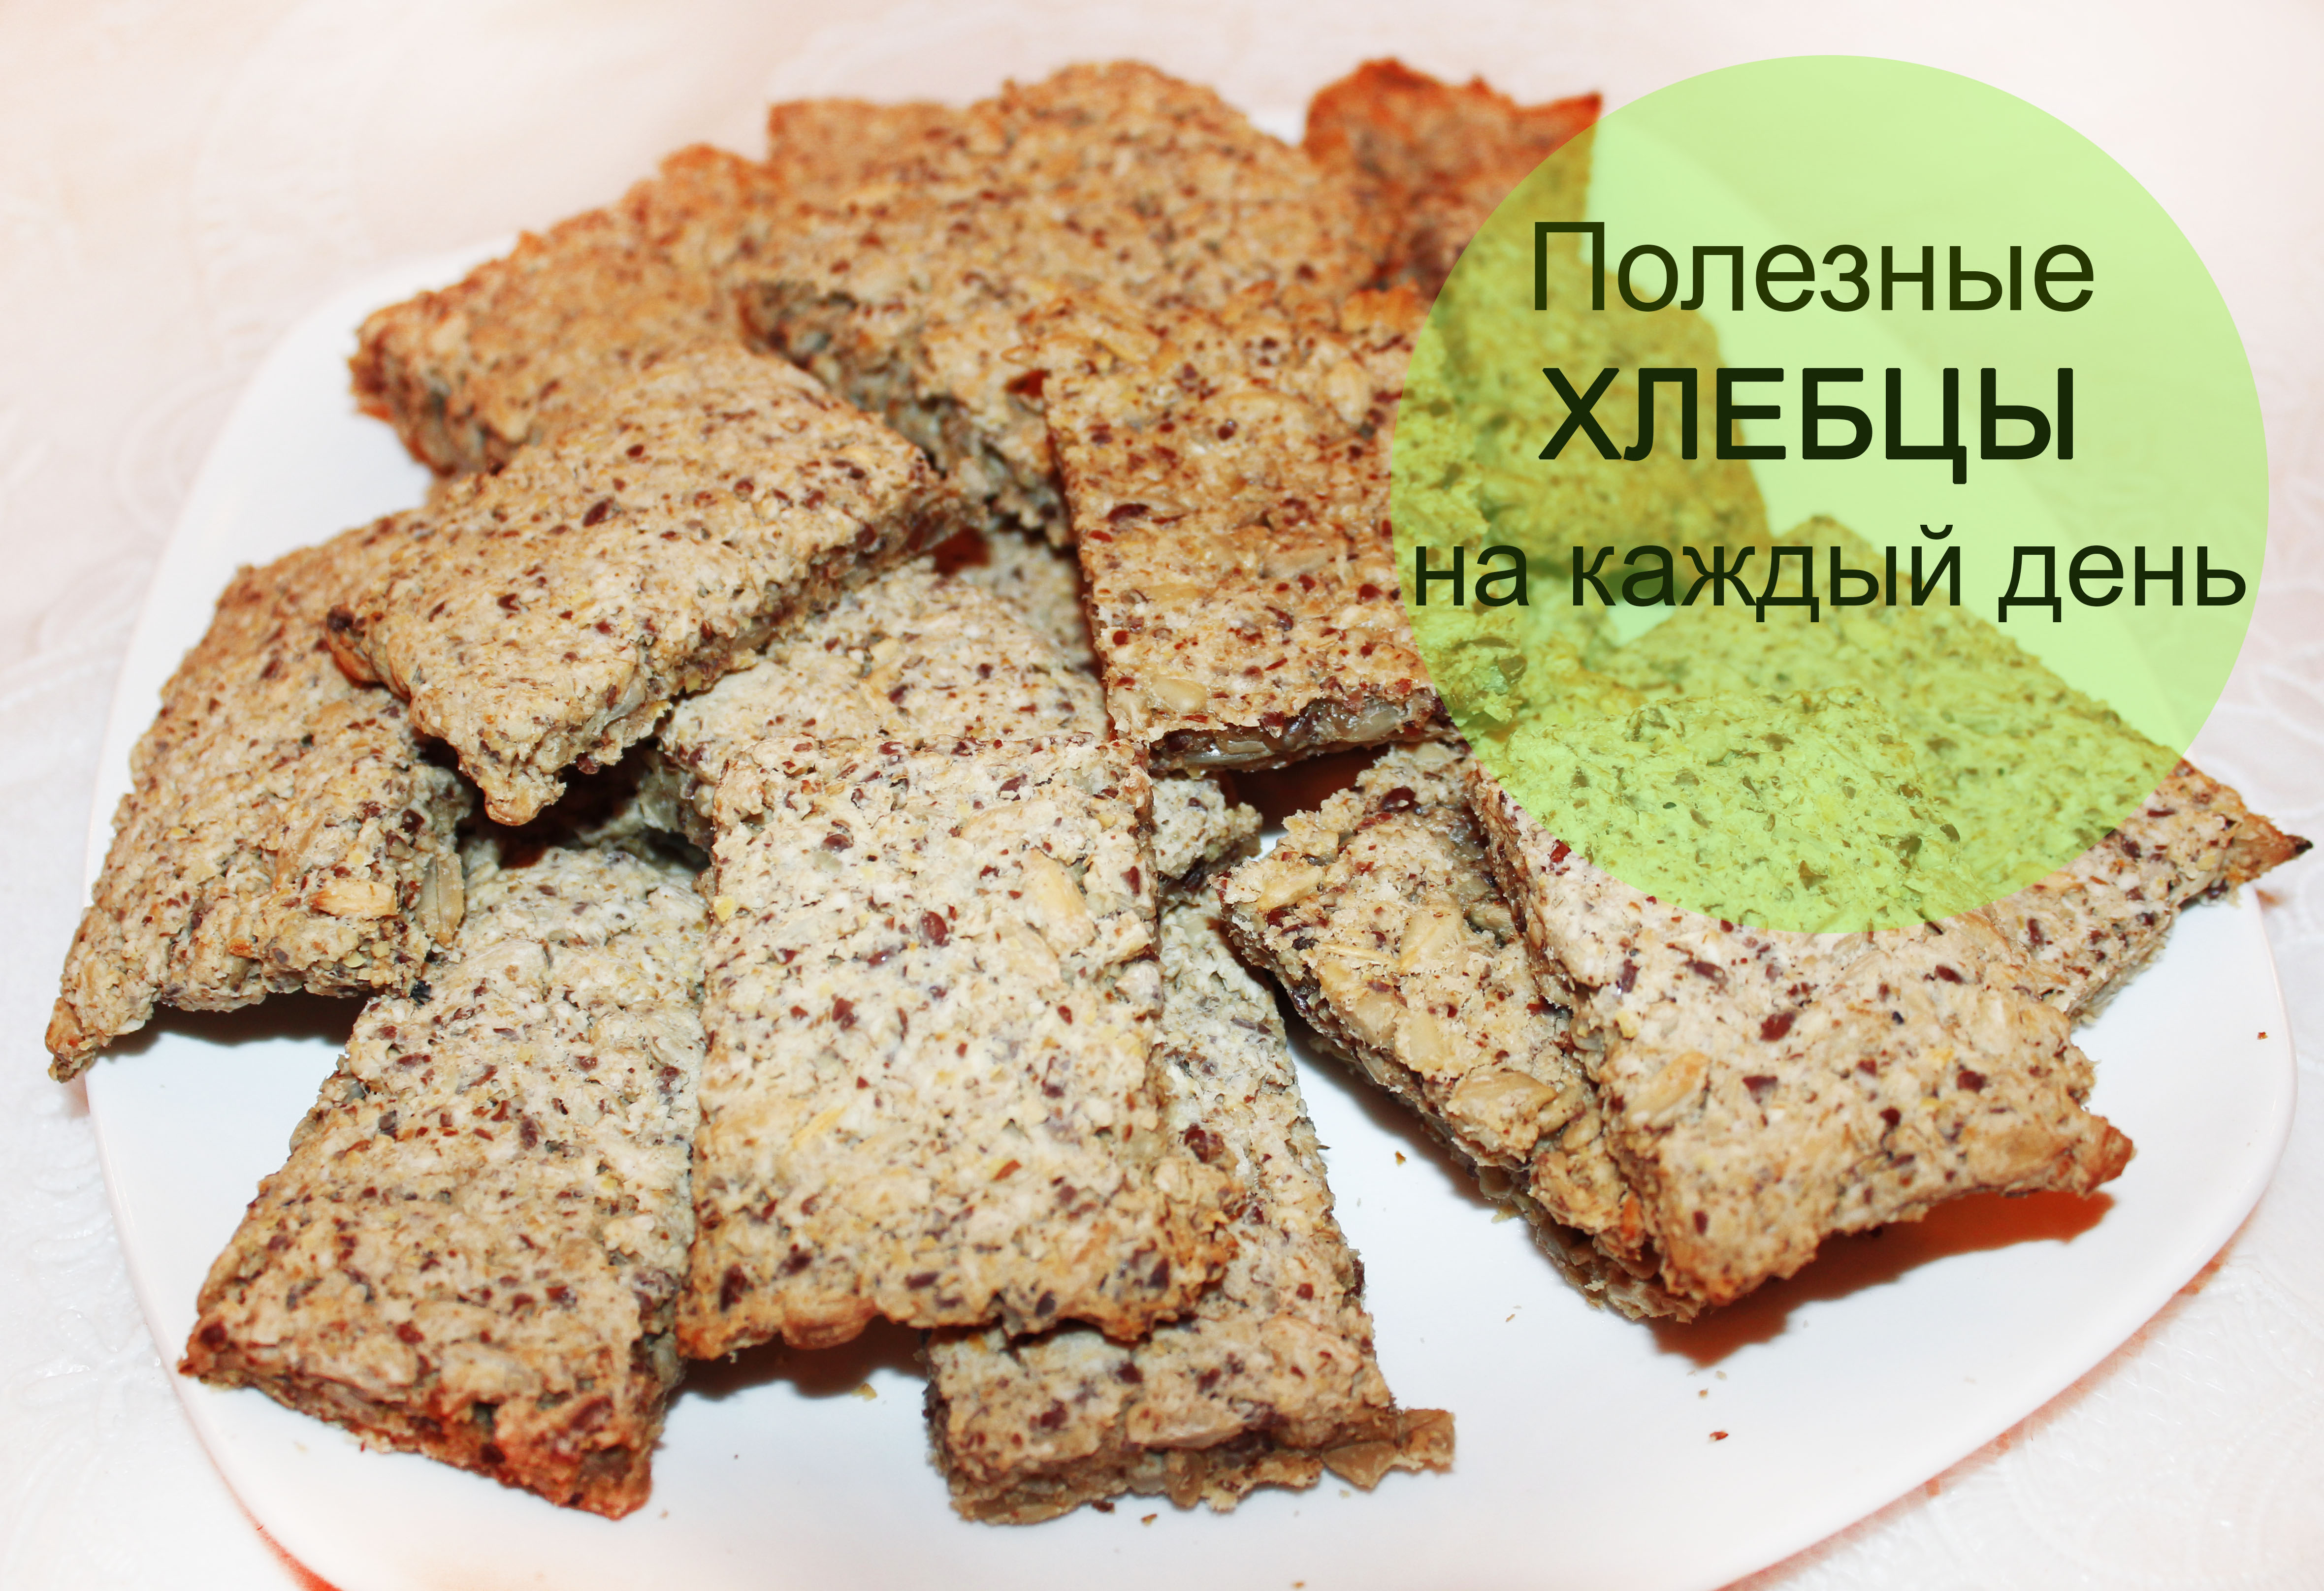 Рецепт низкокалорийного хлеба в домашних условиях